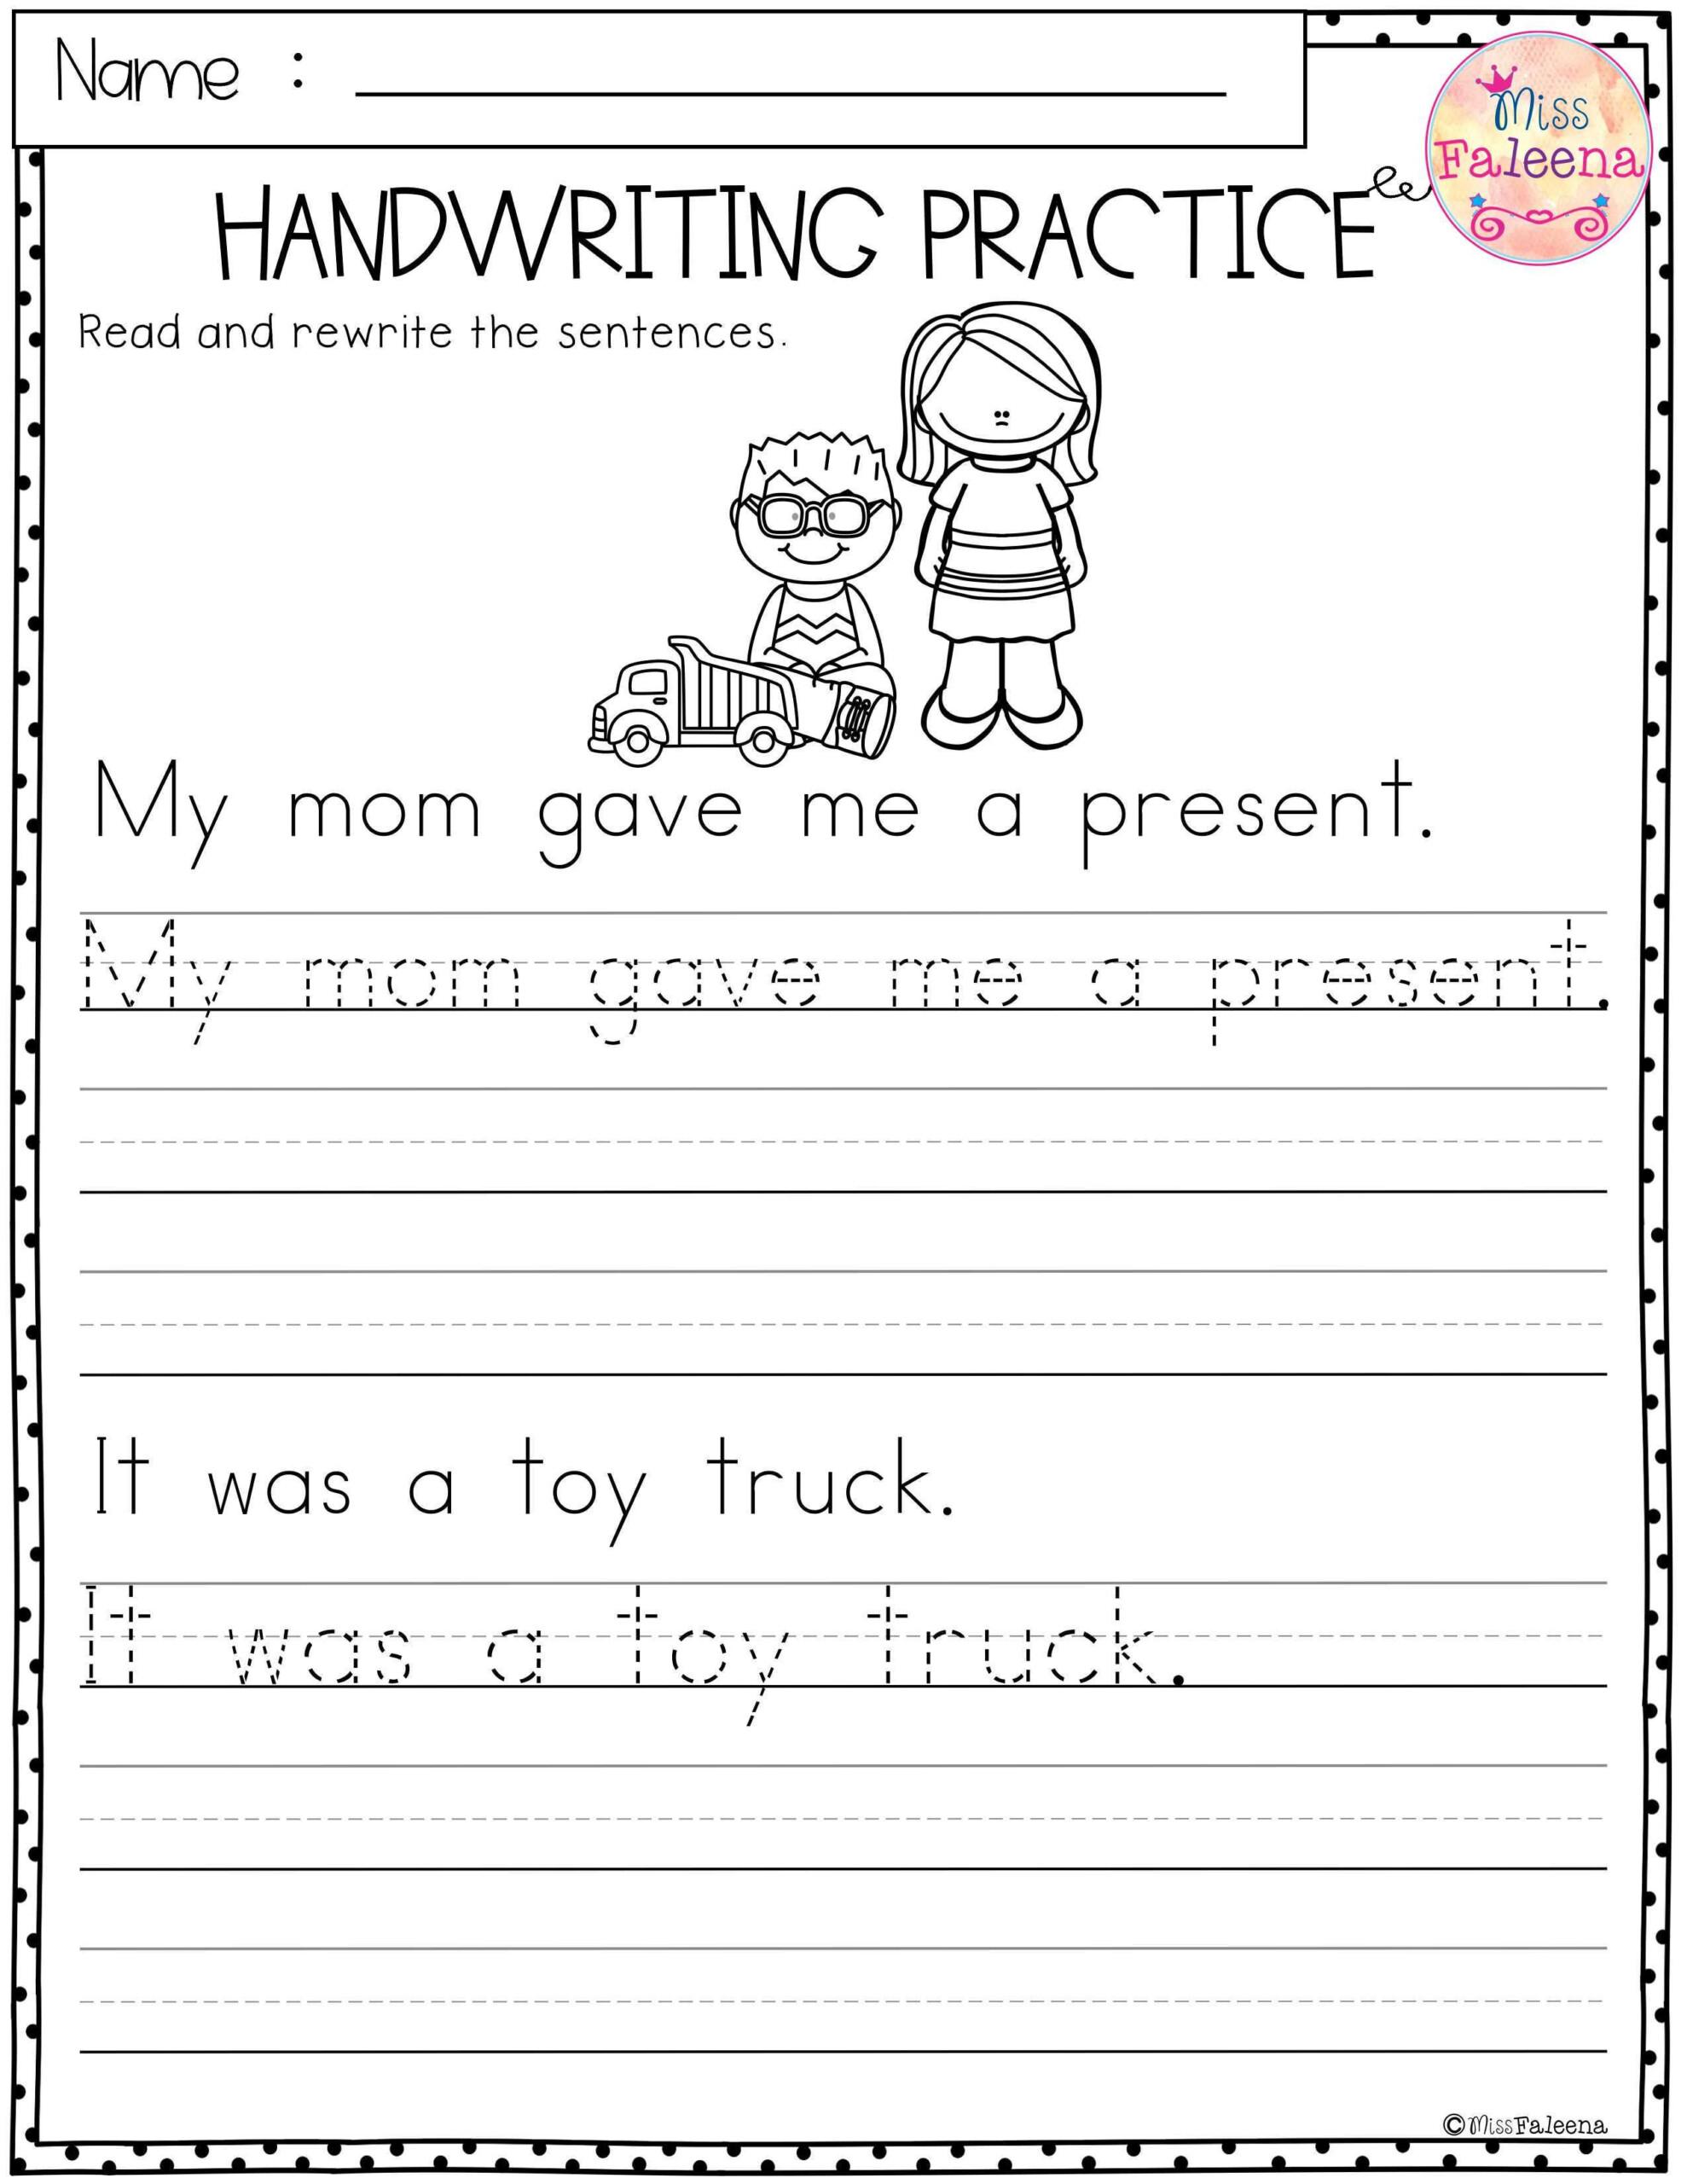 Christmas Handwriting Practice | Handwriting Practice